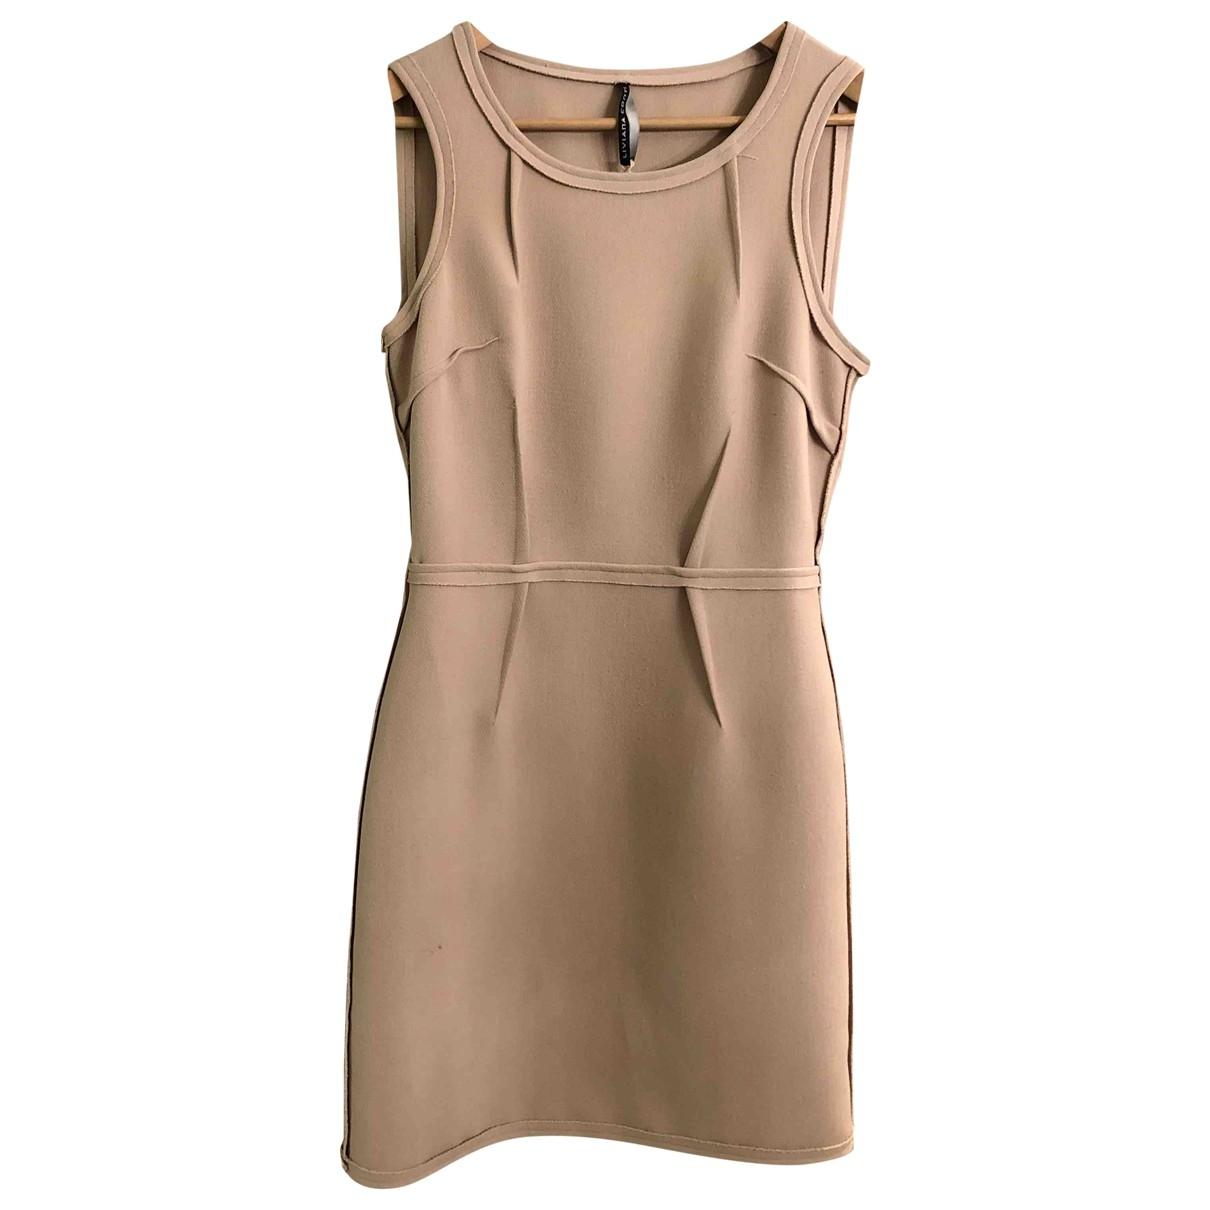 Liviana Conti \N Kleid in  Beige Polyester